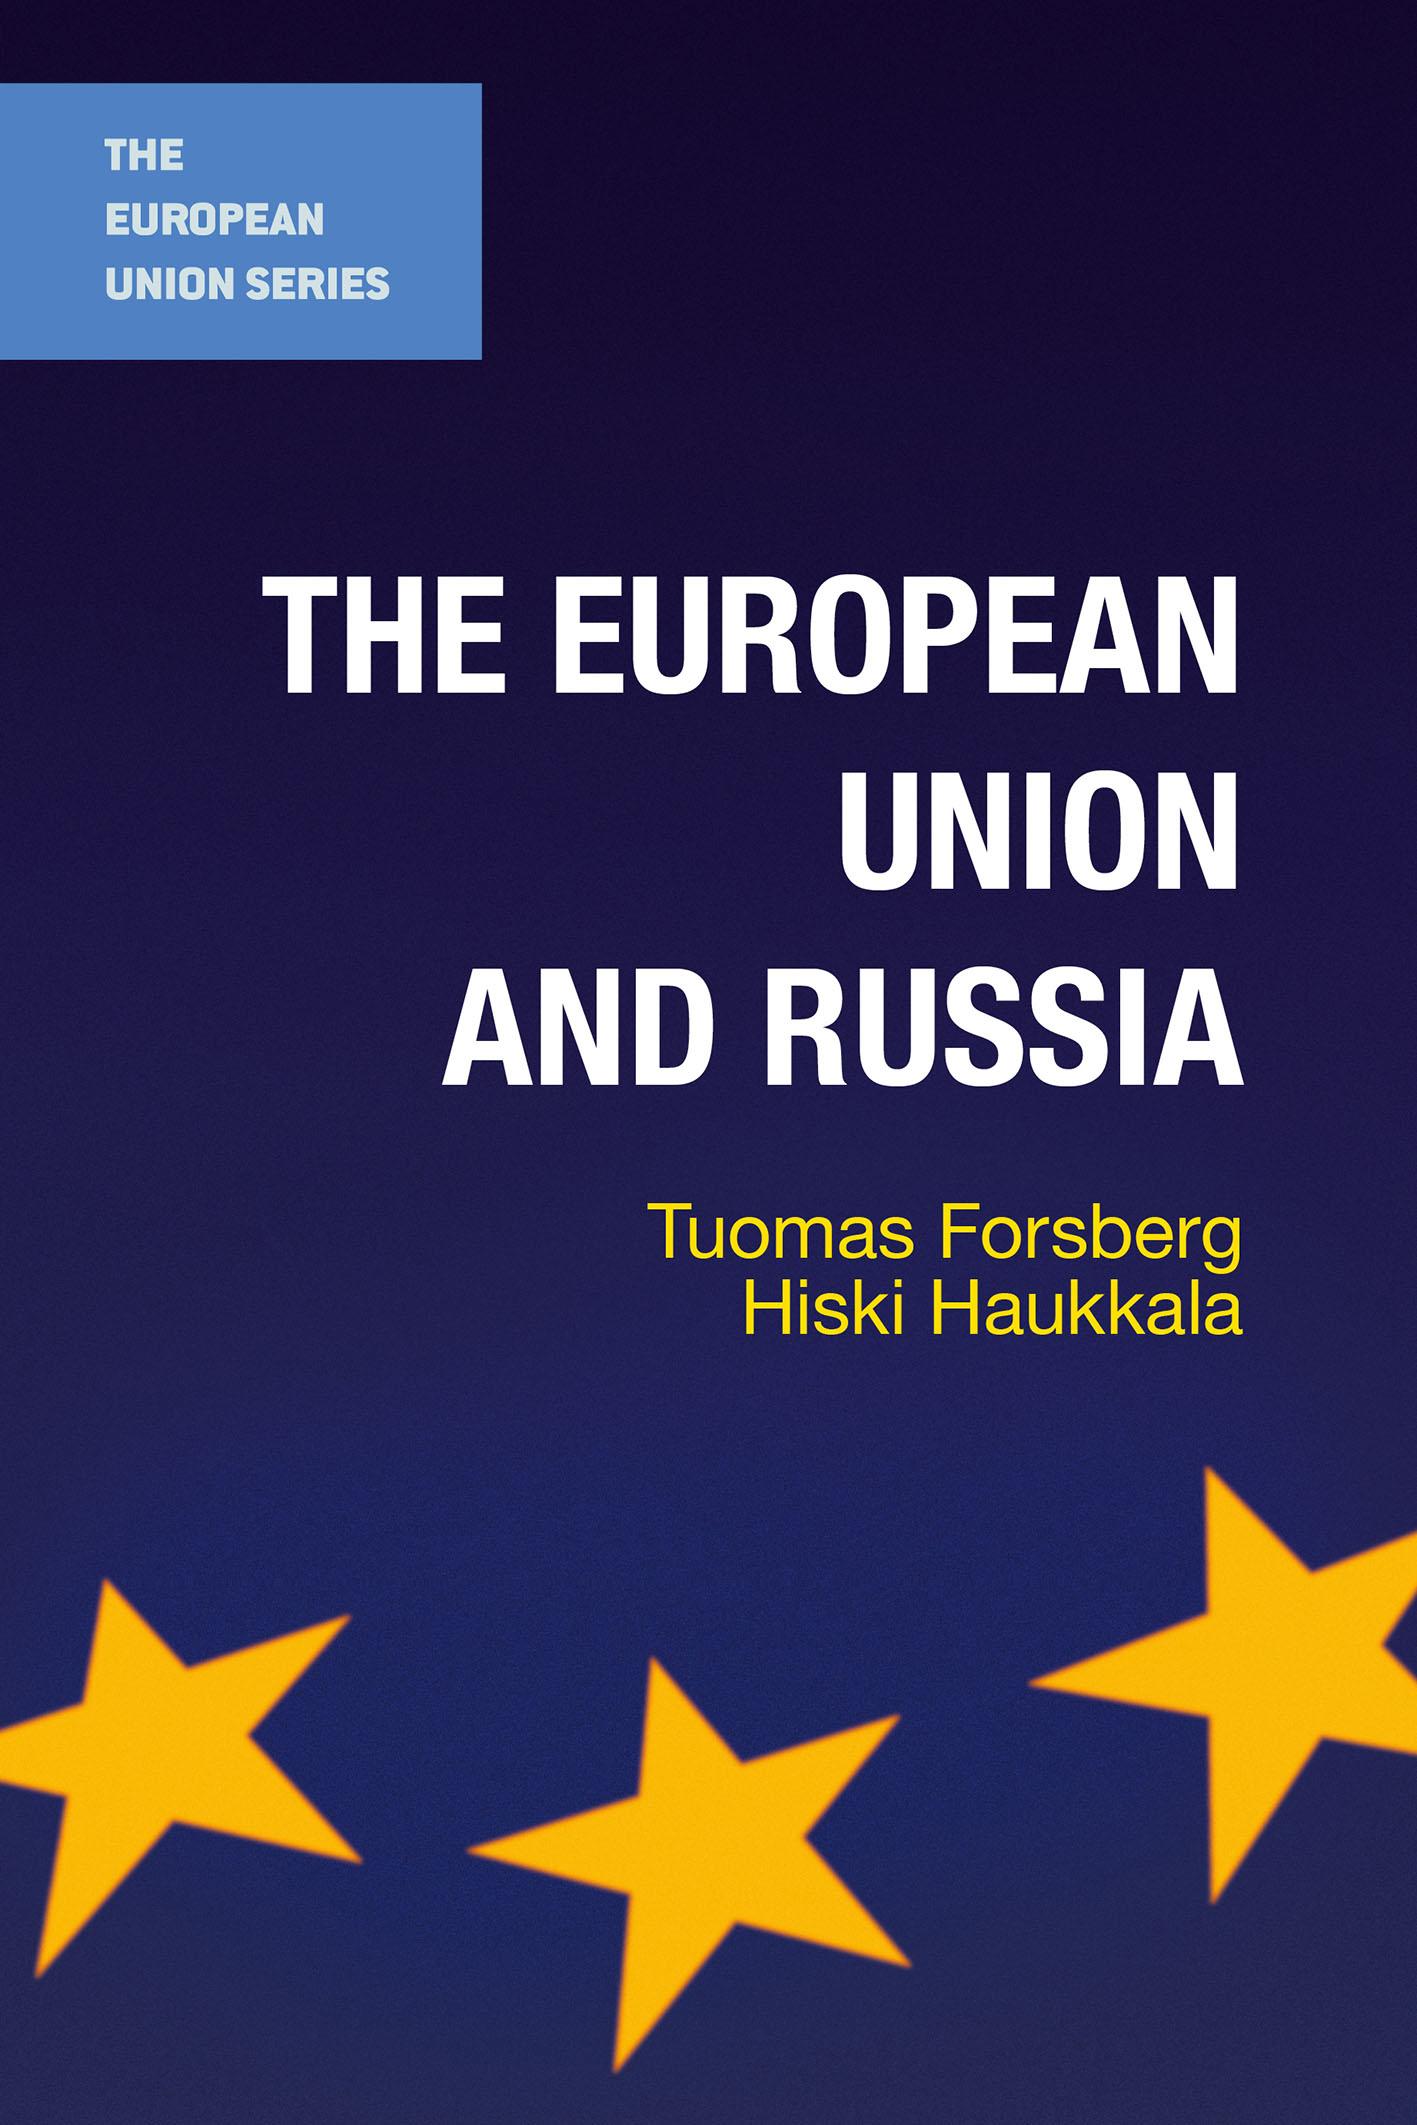 Tuomas Forsberg & Hiski Haukkala: The European Union and Russia. Palgrave 2016, 344 s.